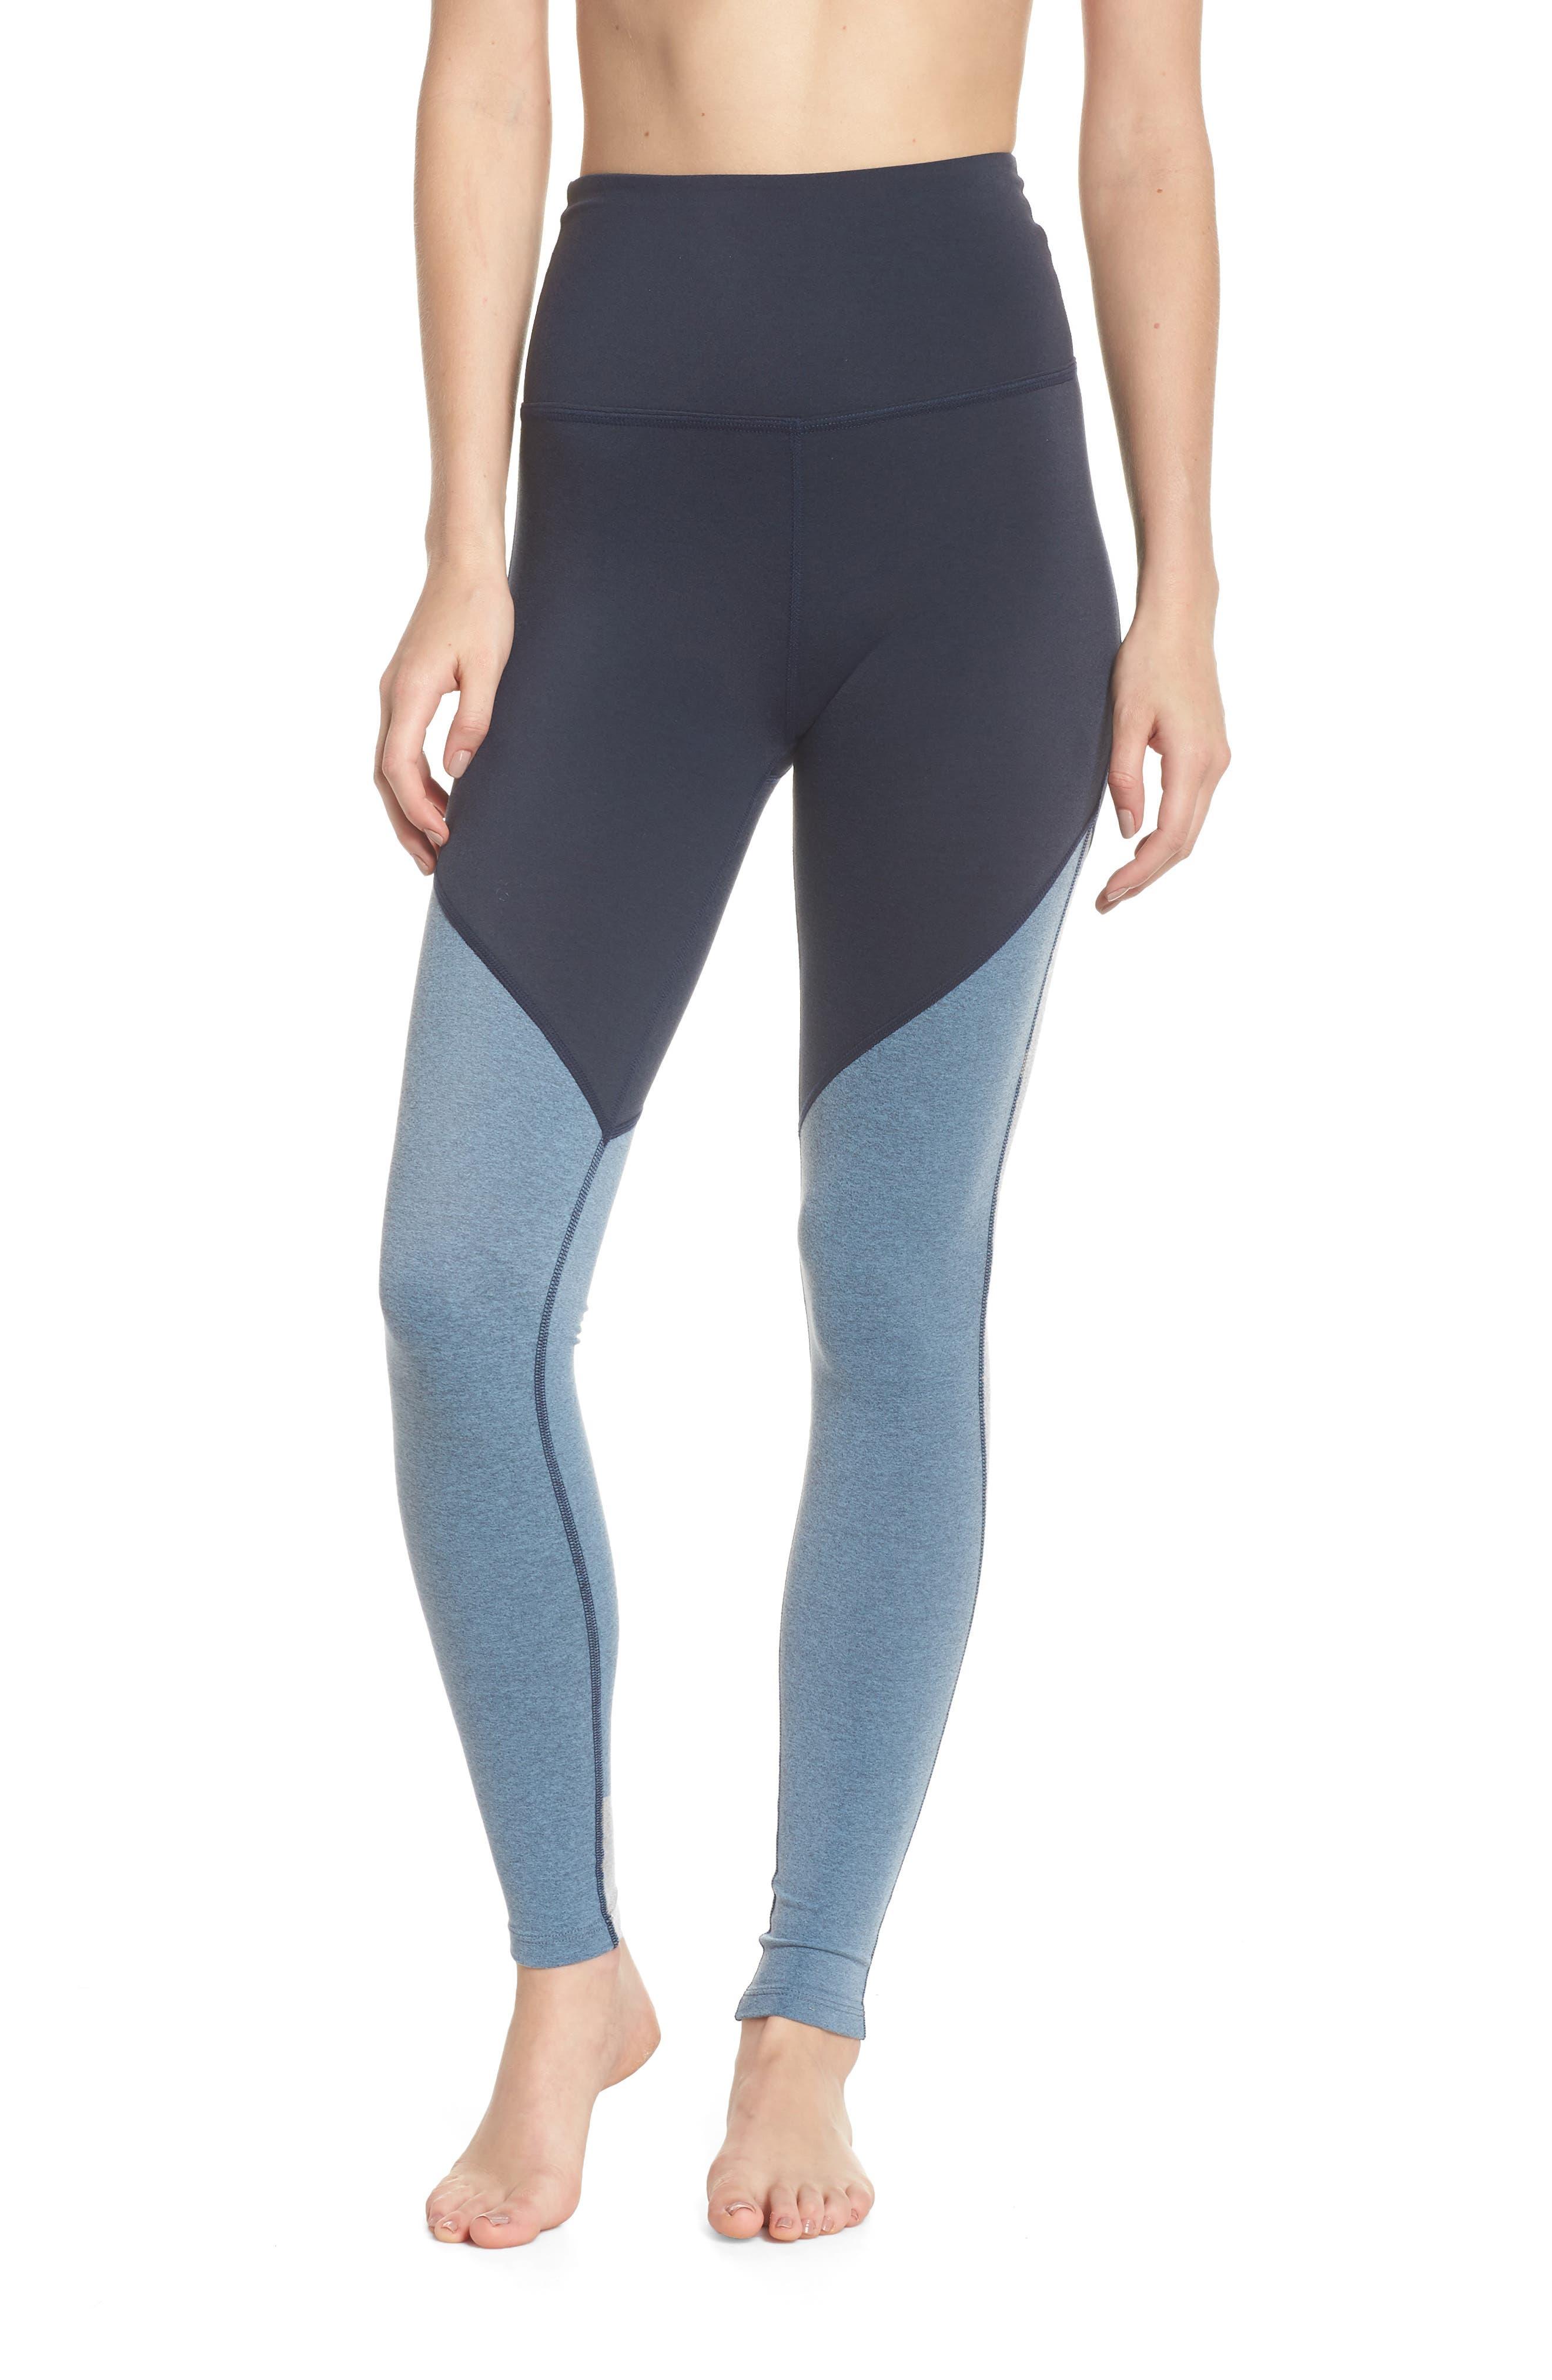 Angled High Waist Leggings,                         Main,                         color, NOCTURNAL NAVY/ LIGHT BLUE